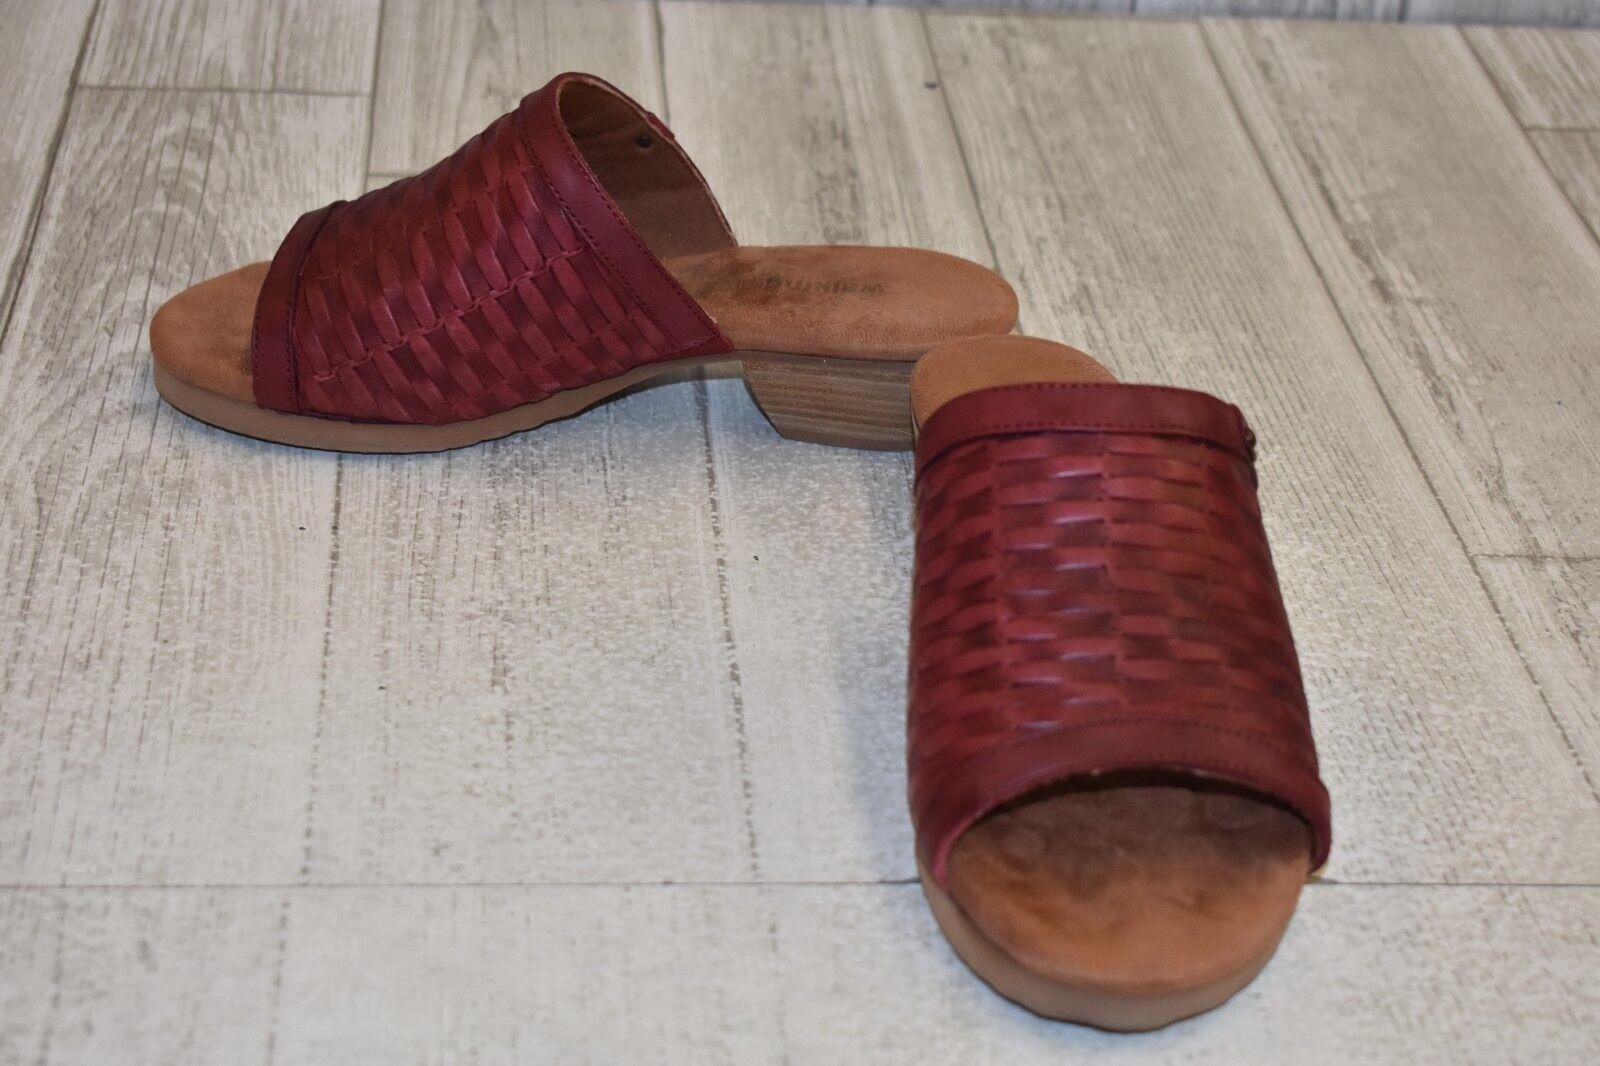 Walking Cradles Cape Heeled Sandal - Women's Size 7.5WW - Red Brown